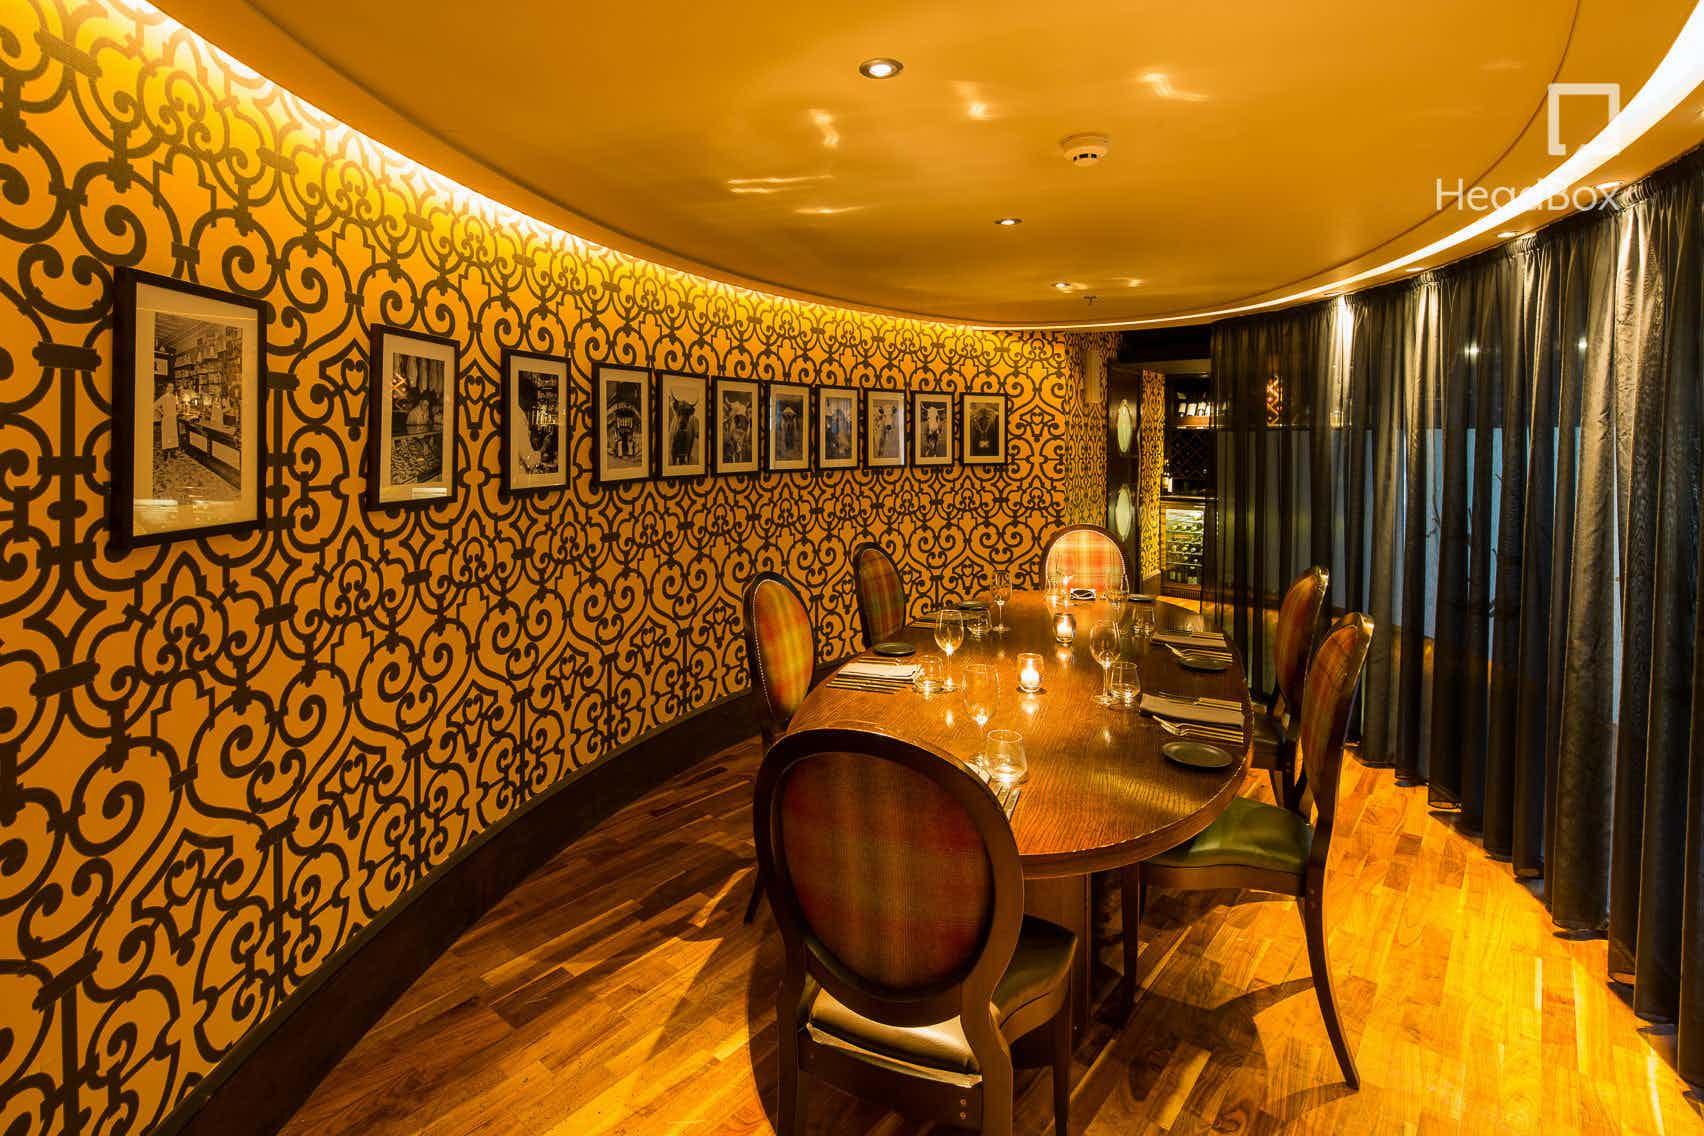 Chef's Table, James Martin Restaurant